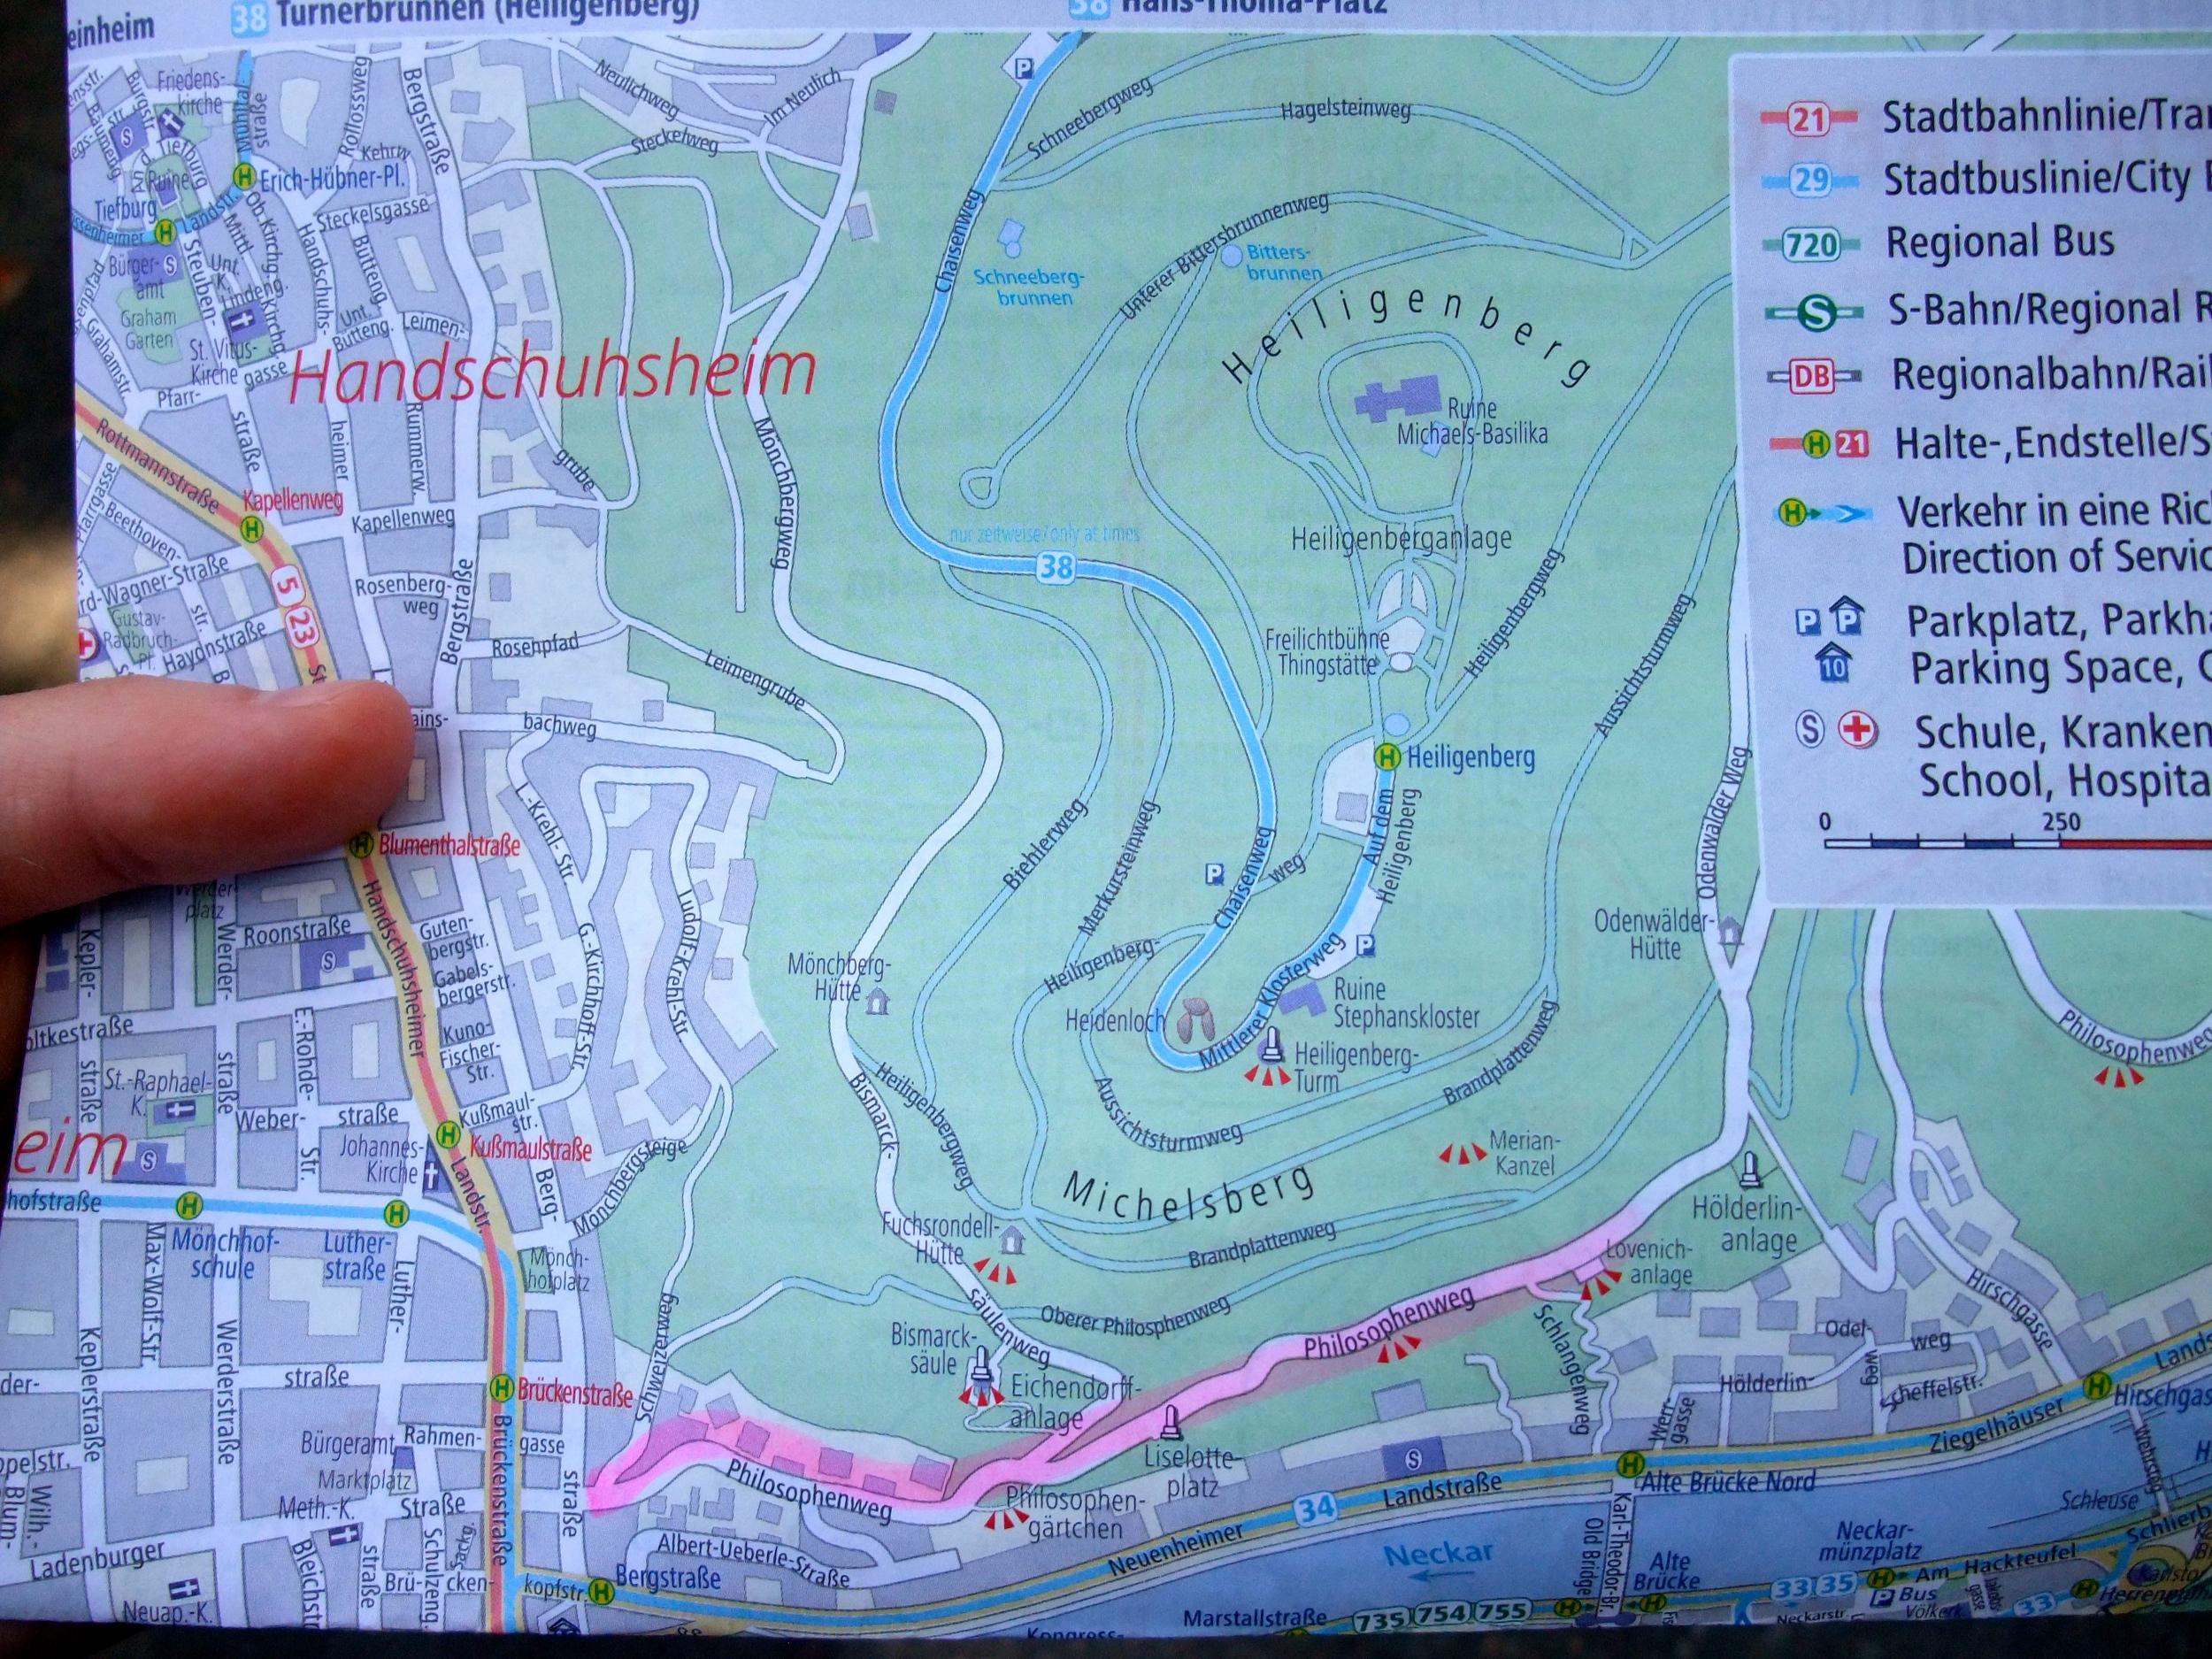 Free tourist map